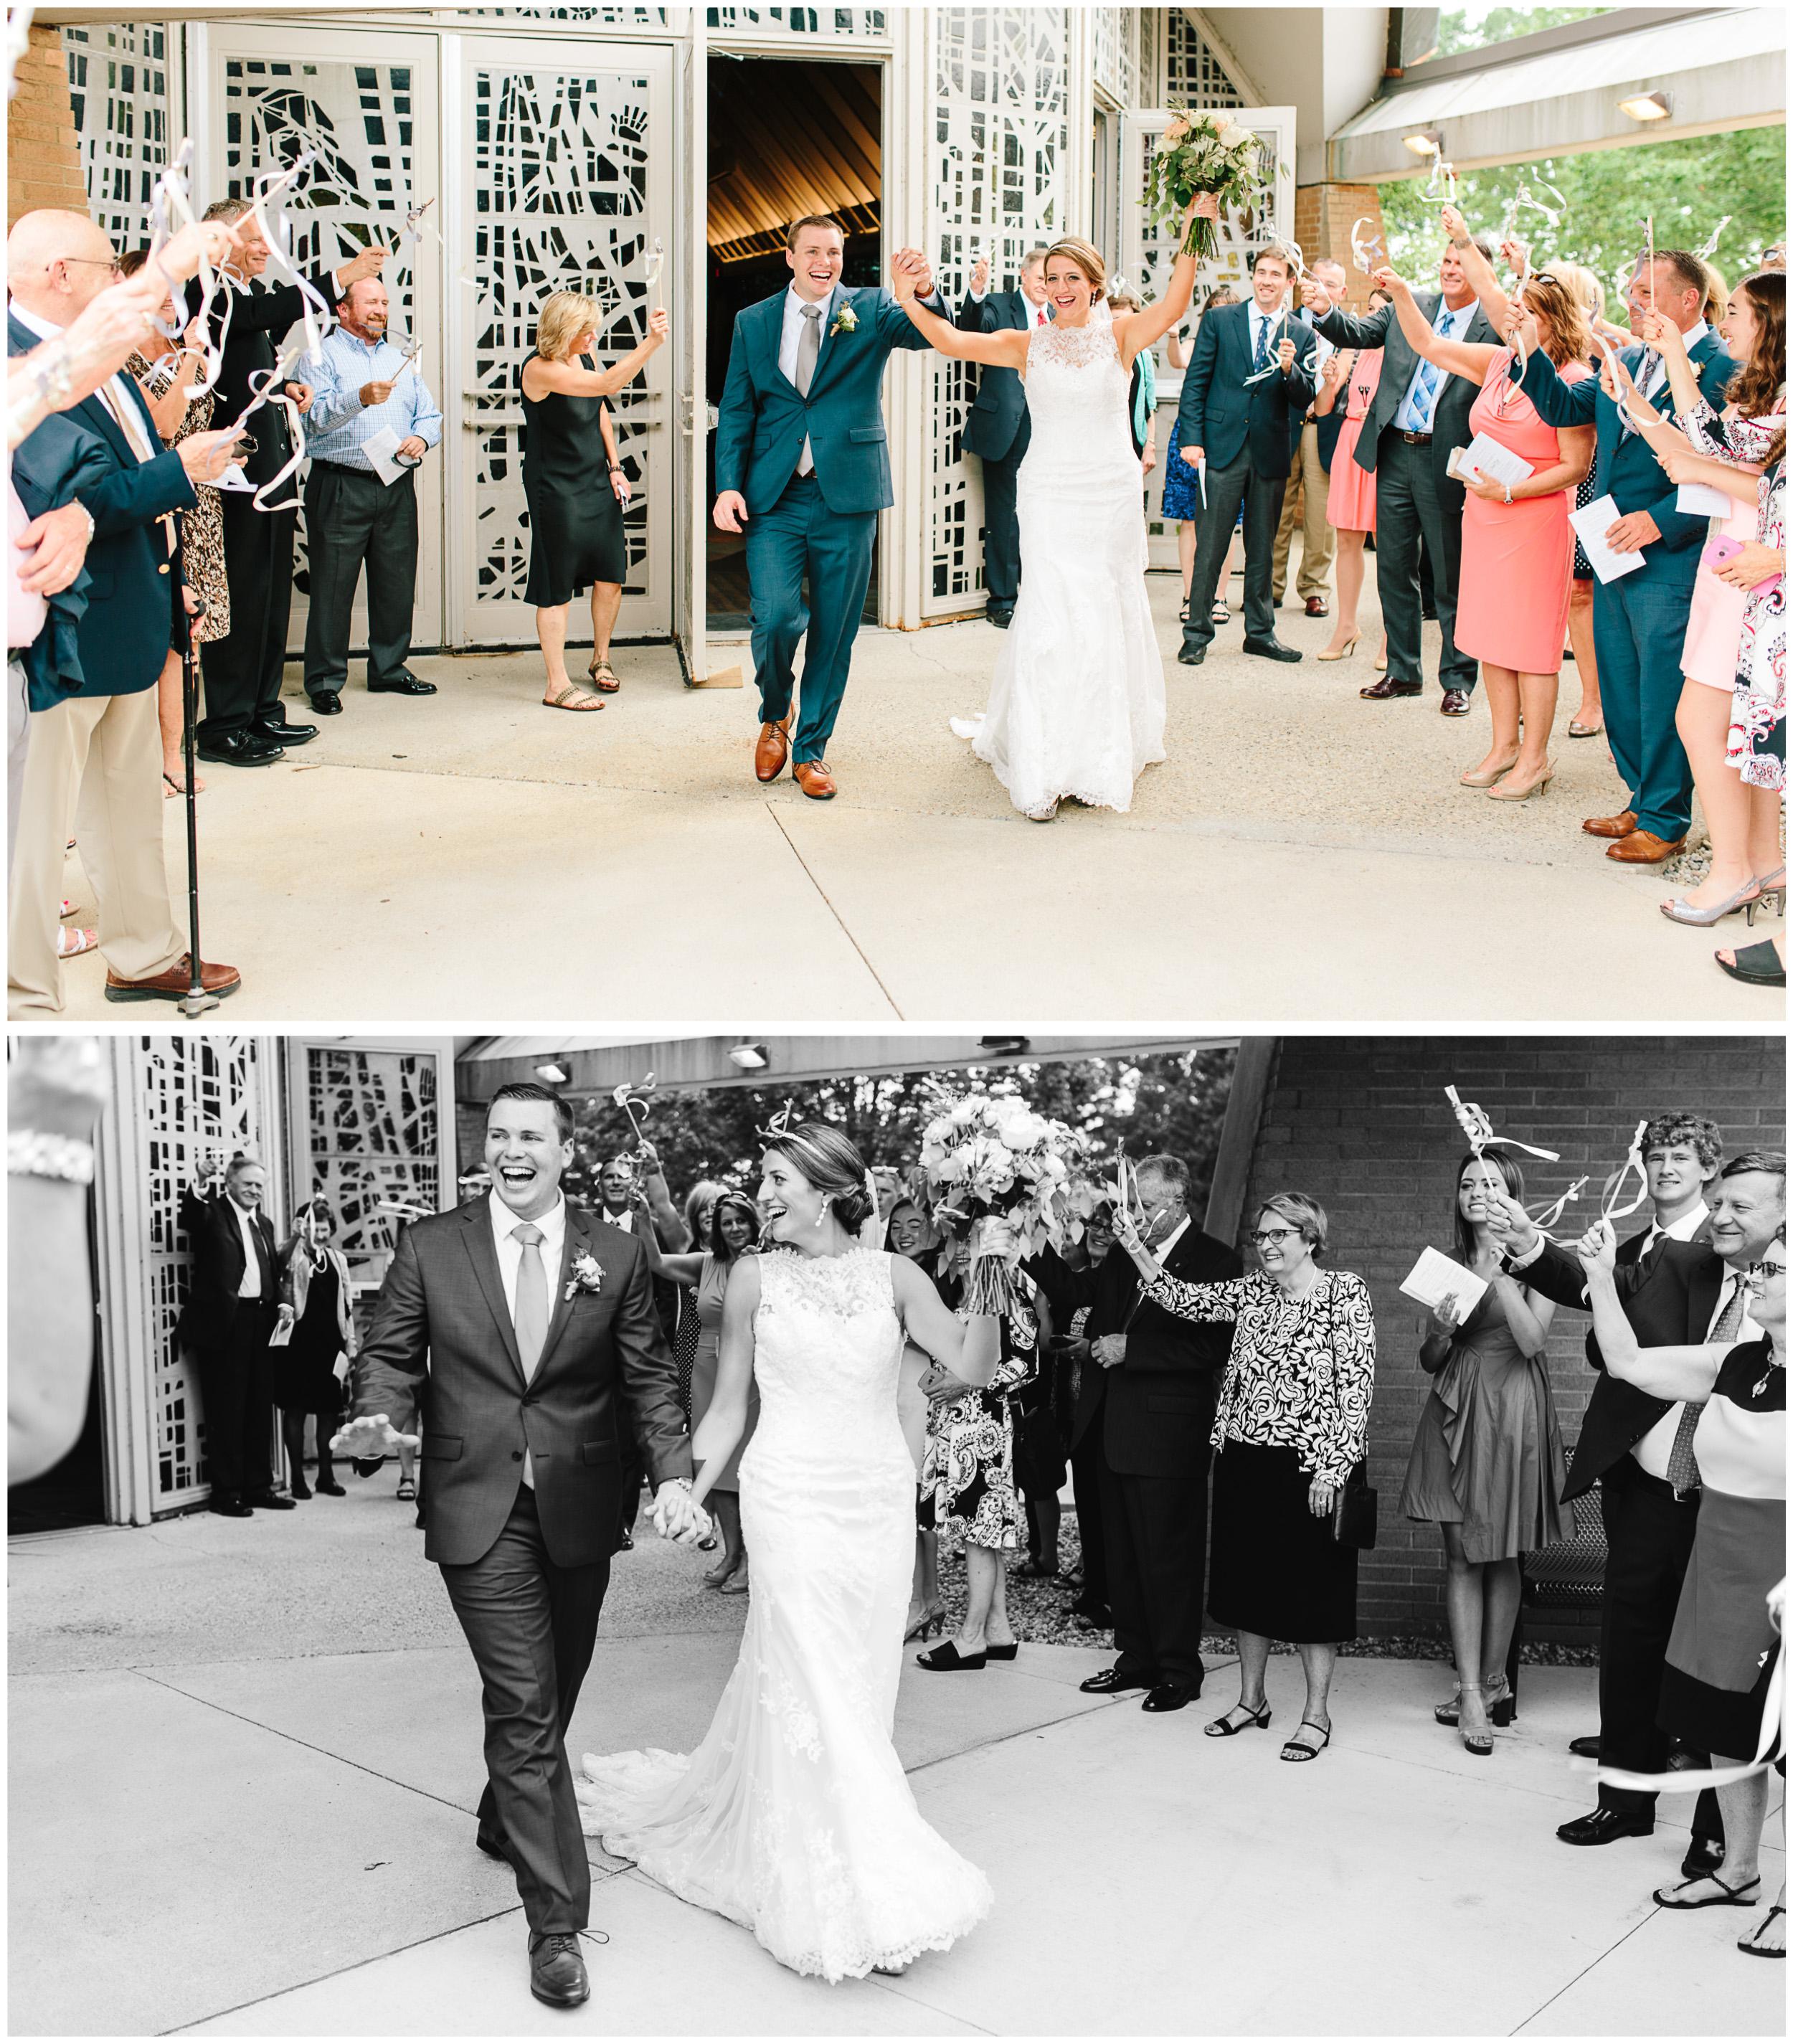 ann_arbor_michigan_wedding_70.jpg